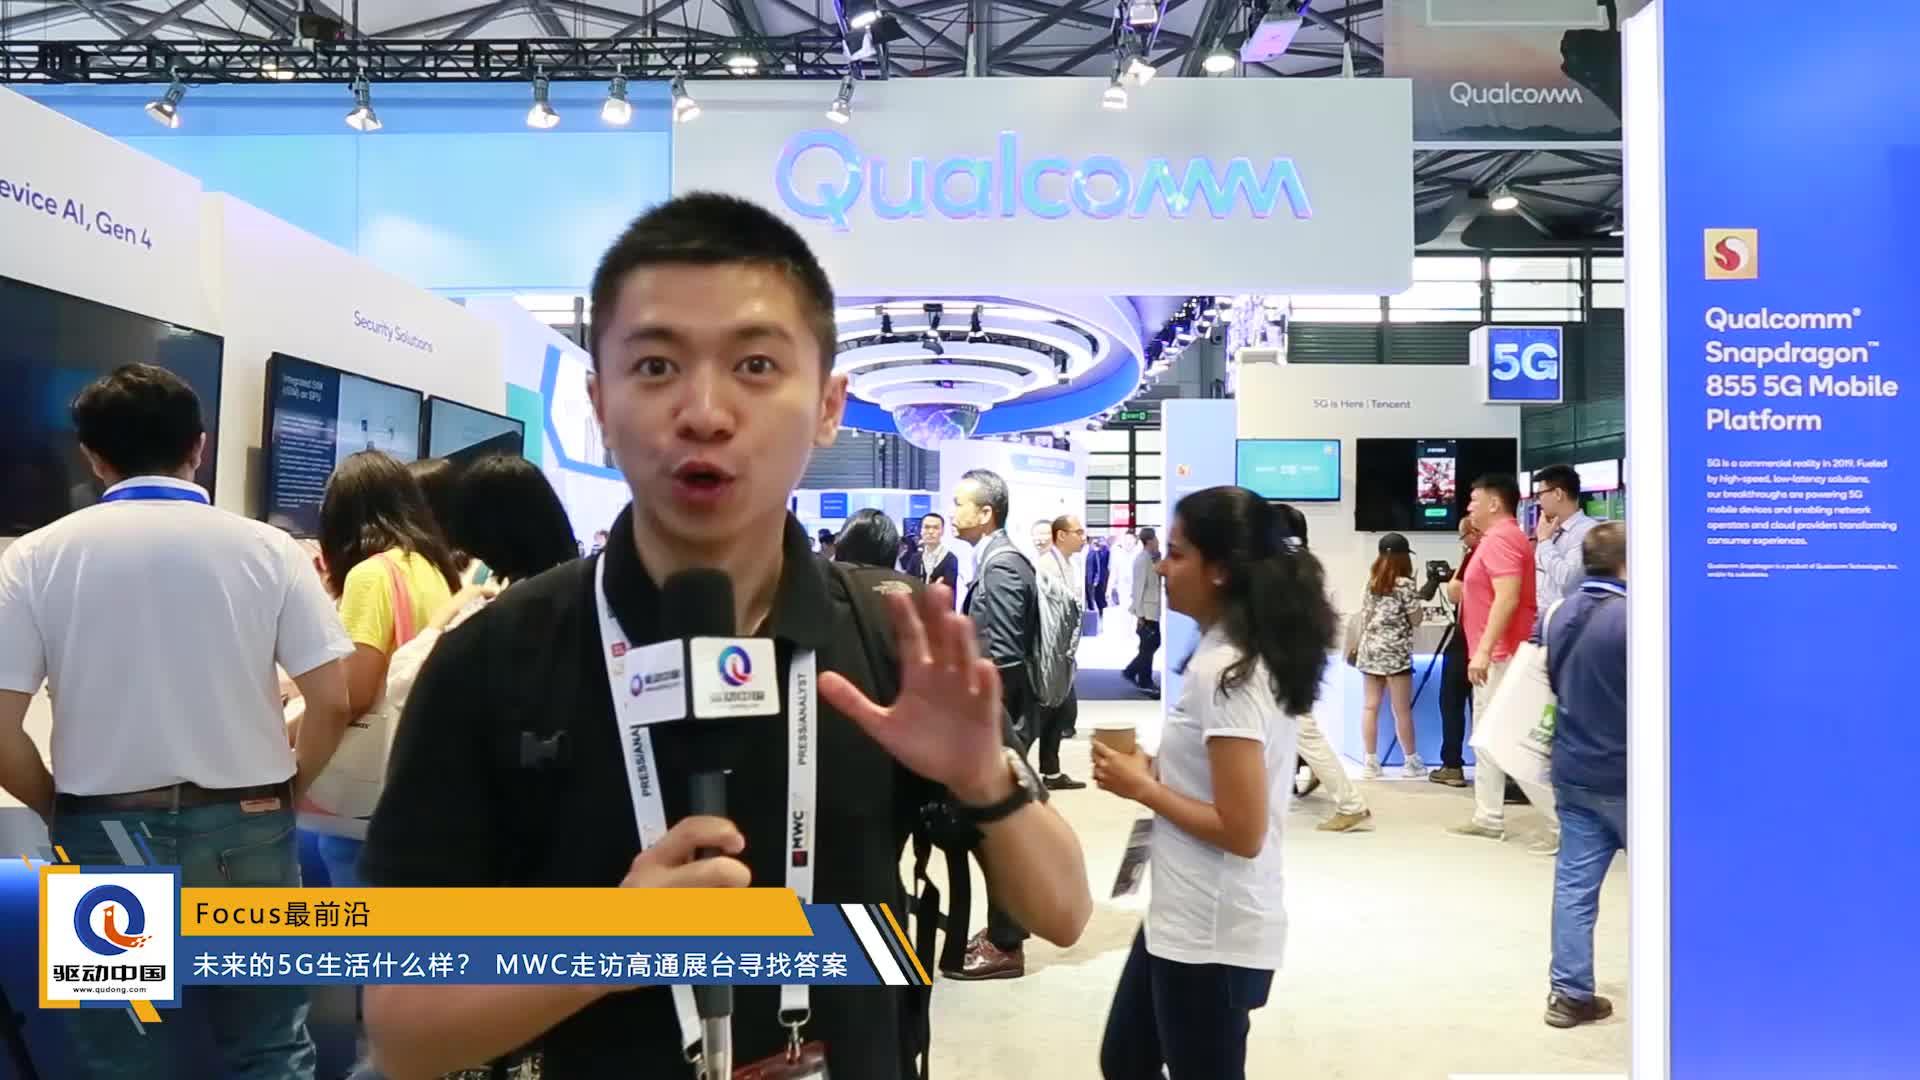 MWC19:未来5G生活什么样? 走访高通展台寻找答案